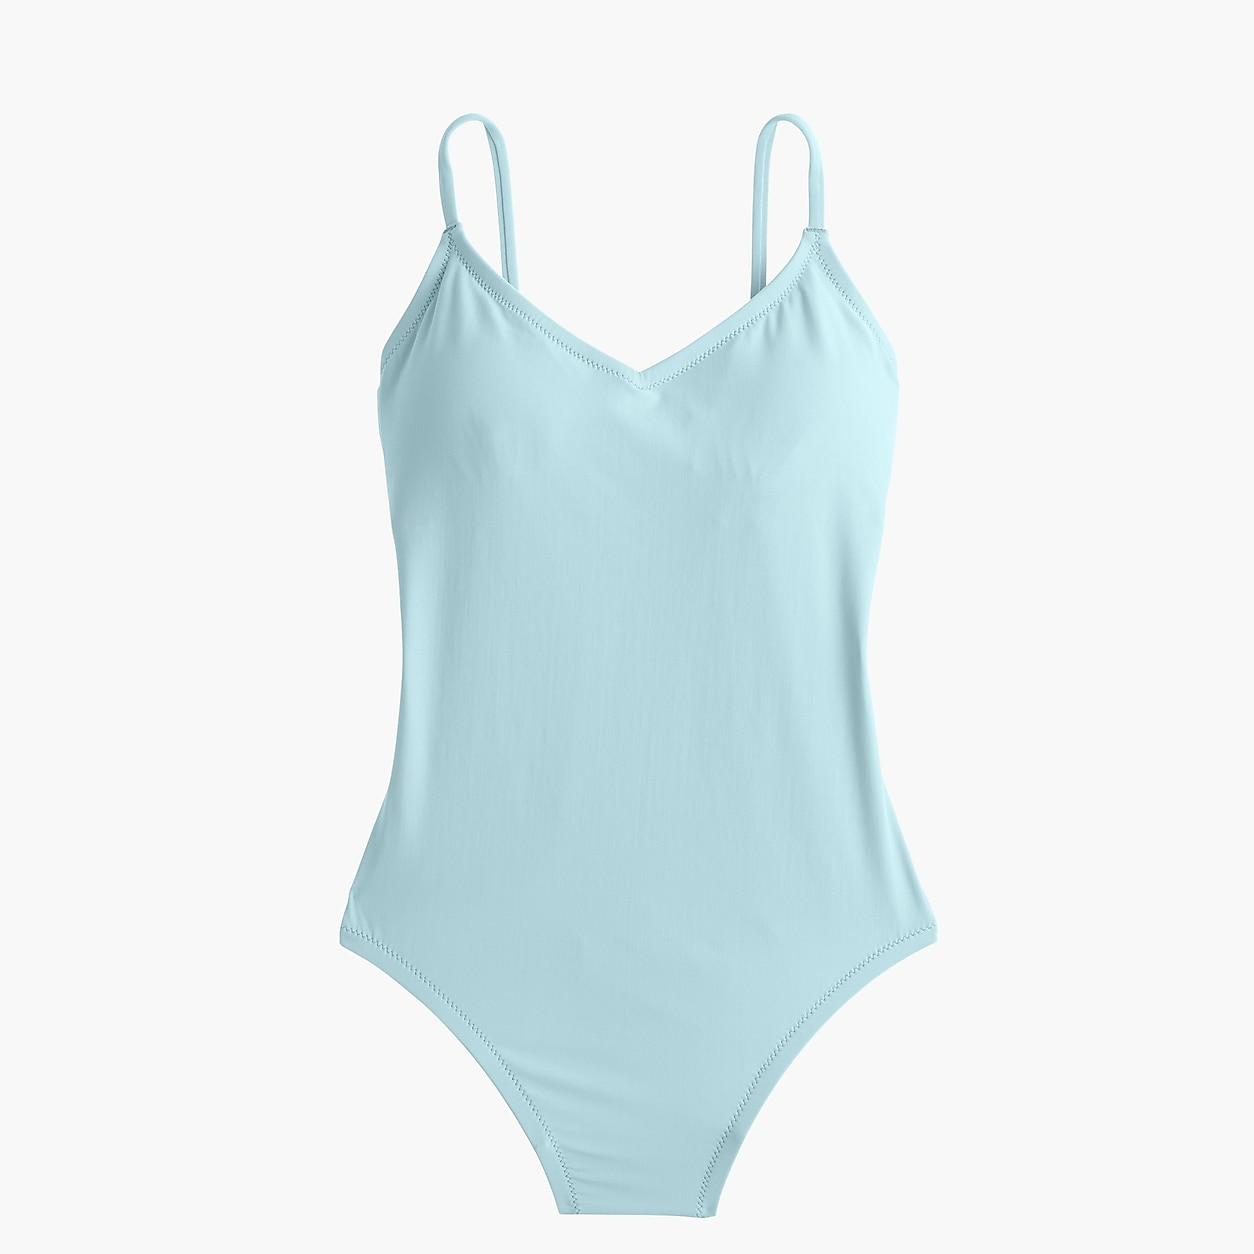 Ballet One-Piece Swimsuit